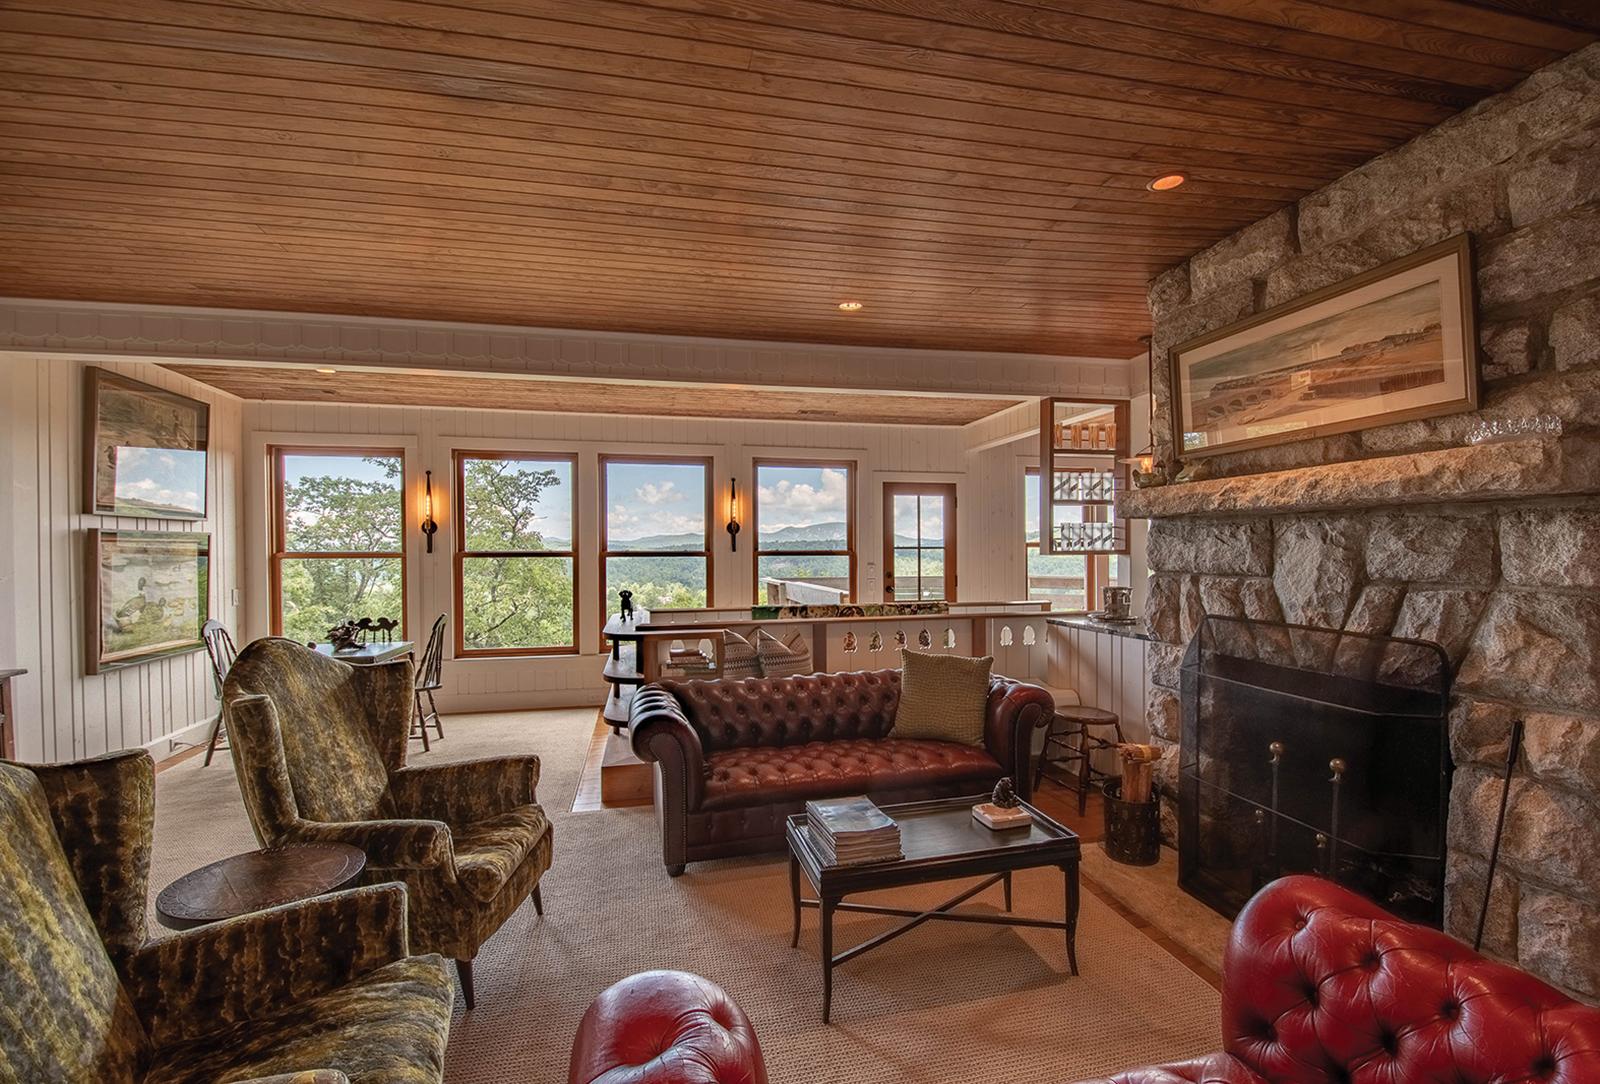 highlands nc homes for sale living room